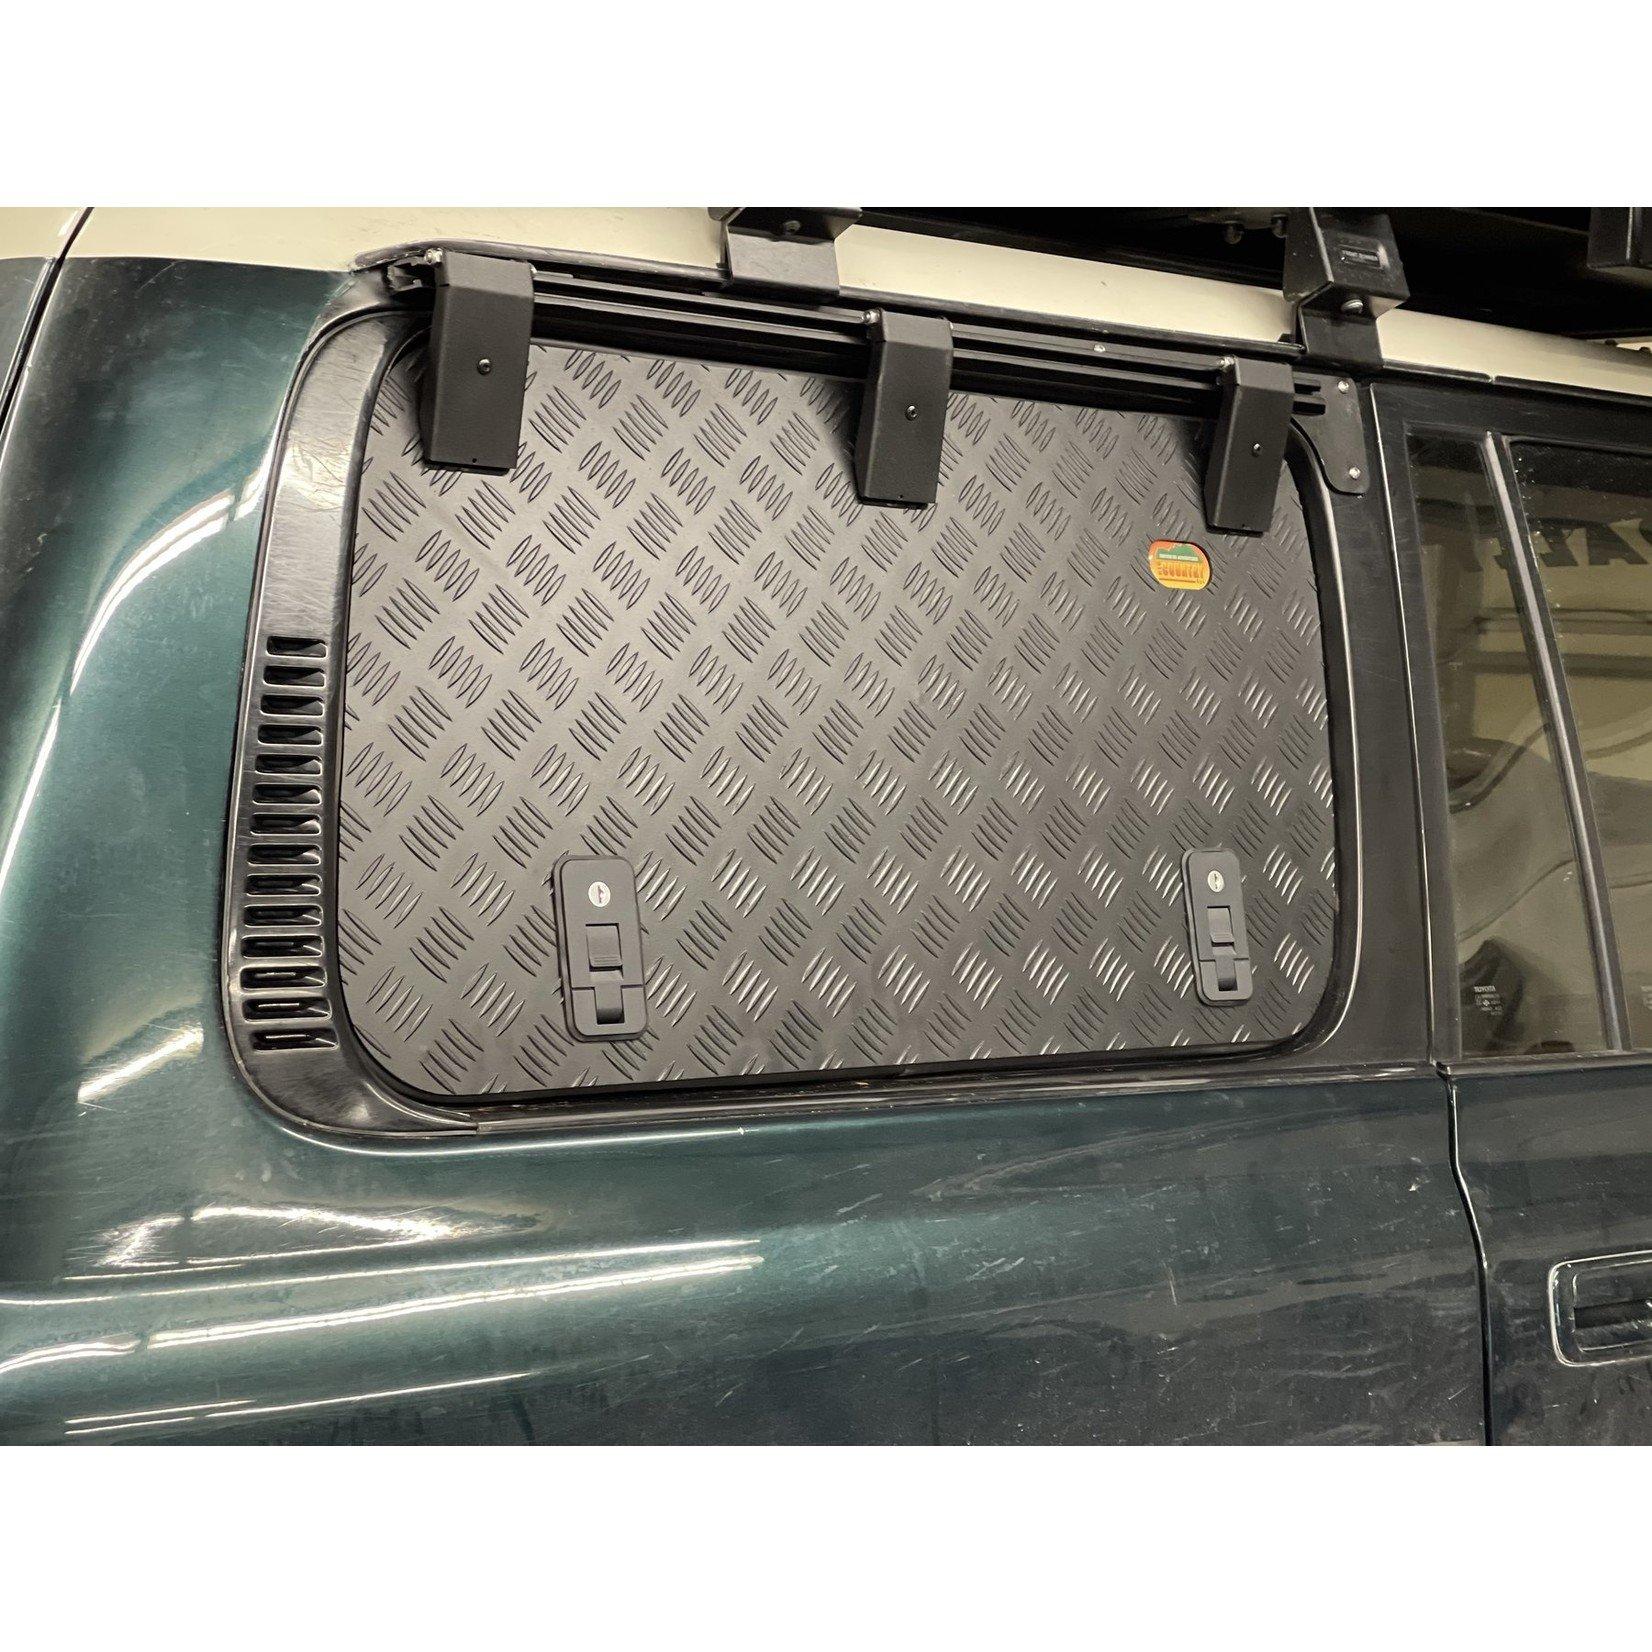 Big Country 4x4 Big Country 4x4 Toyota Land Cruiser 80/Lexus LX450 Gullwing Doors